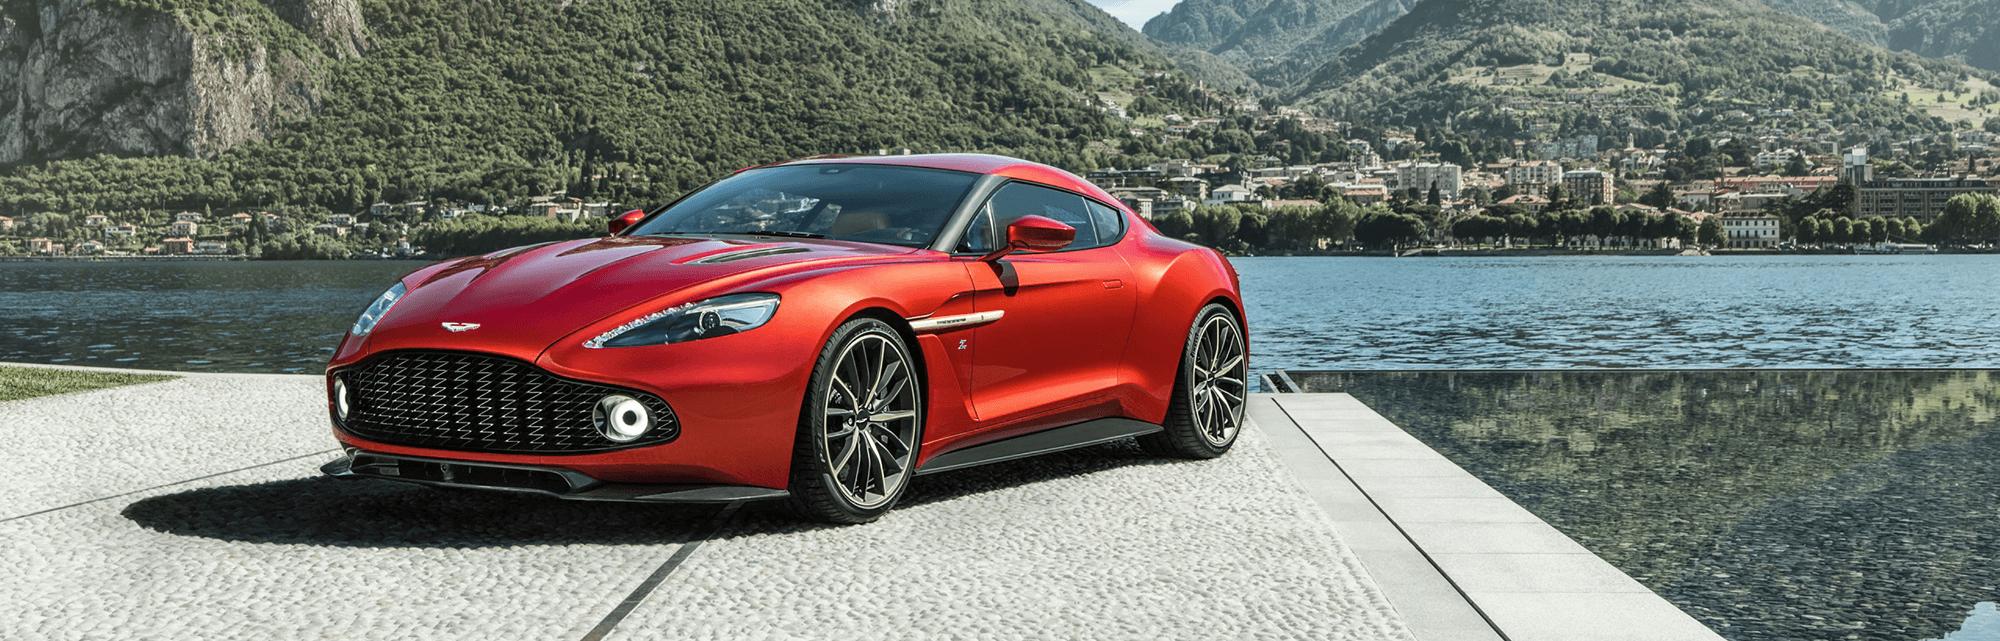 Star Motor Cars - Aston martin dealership texas